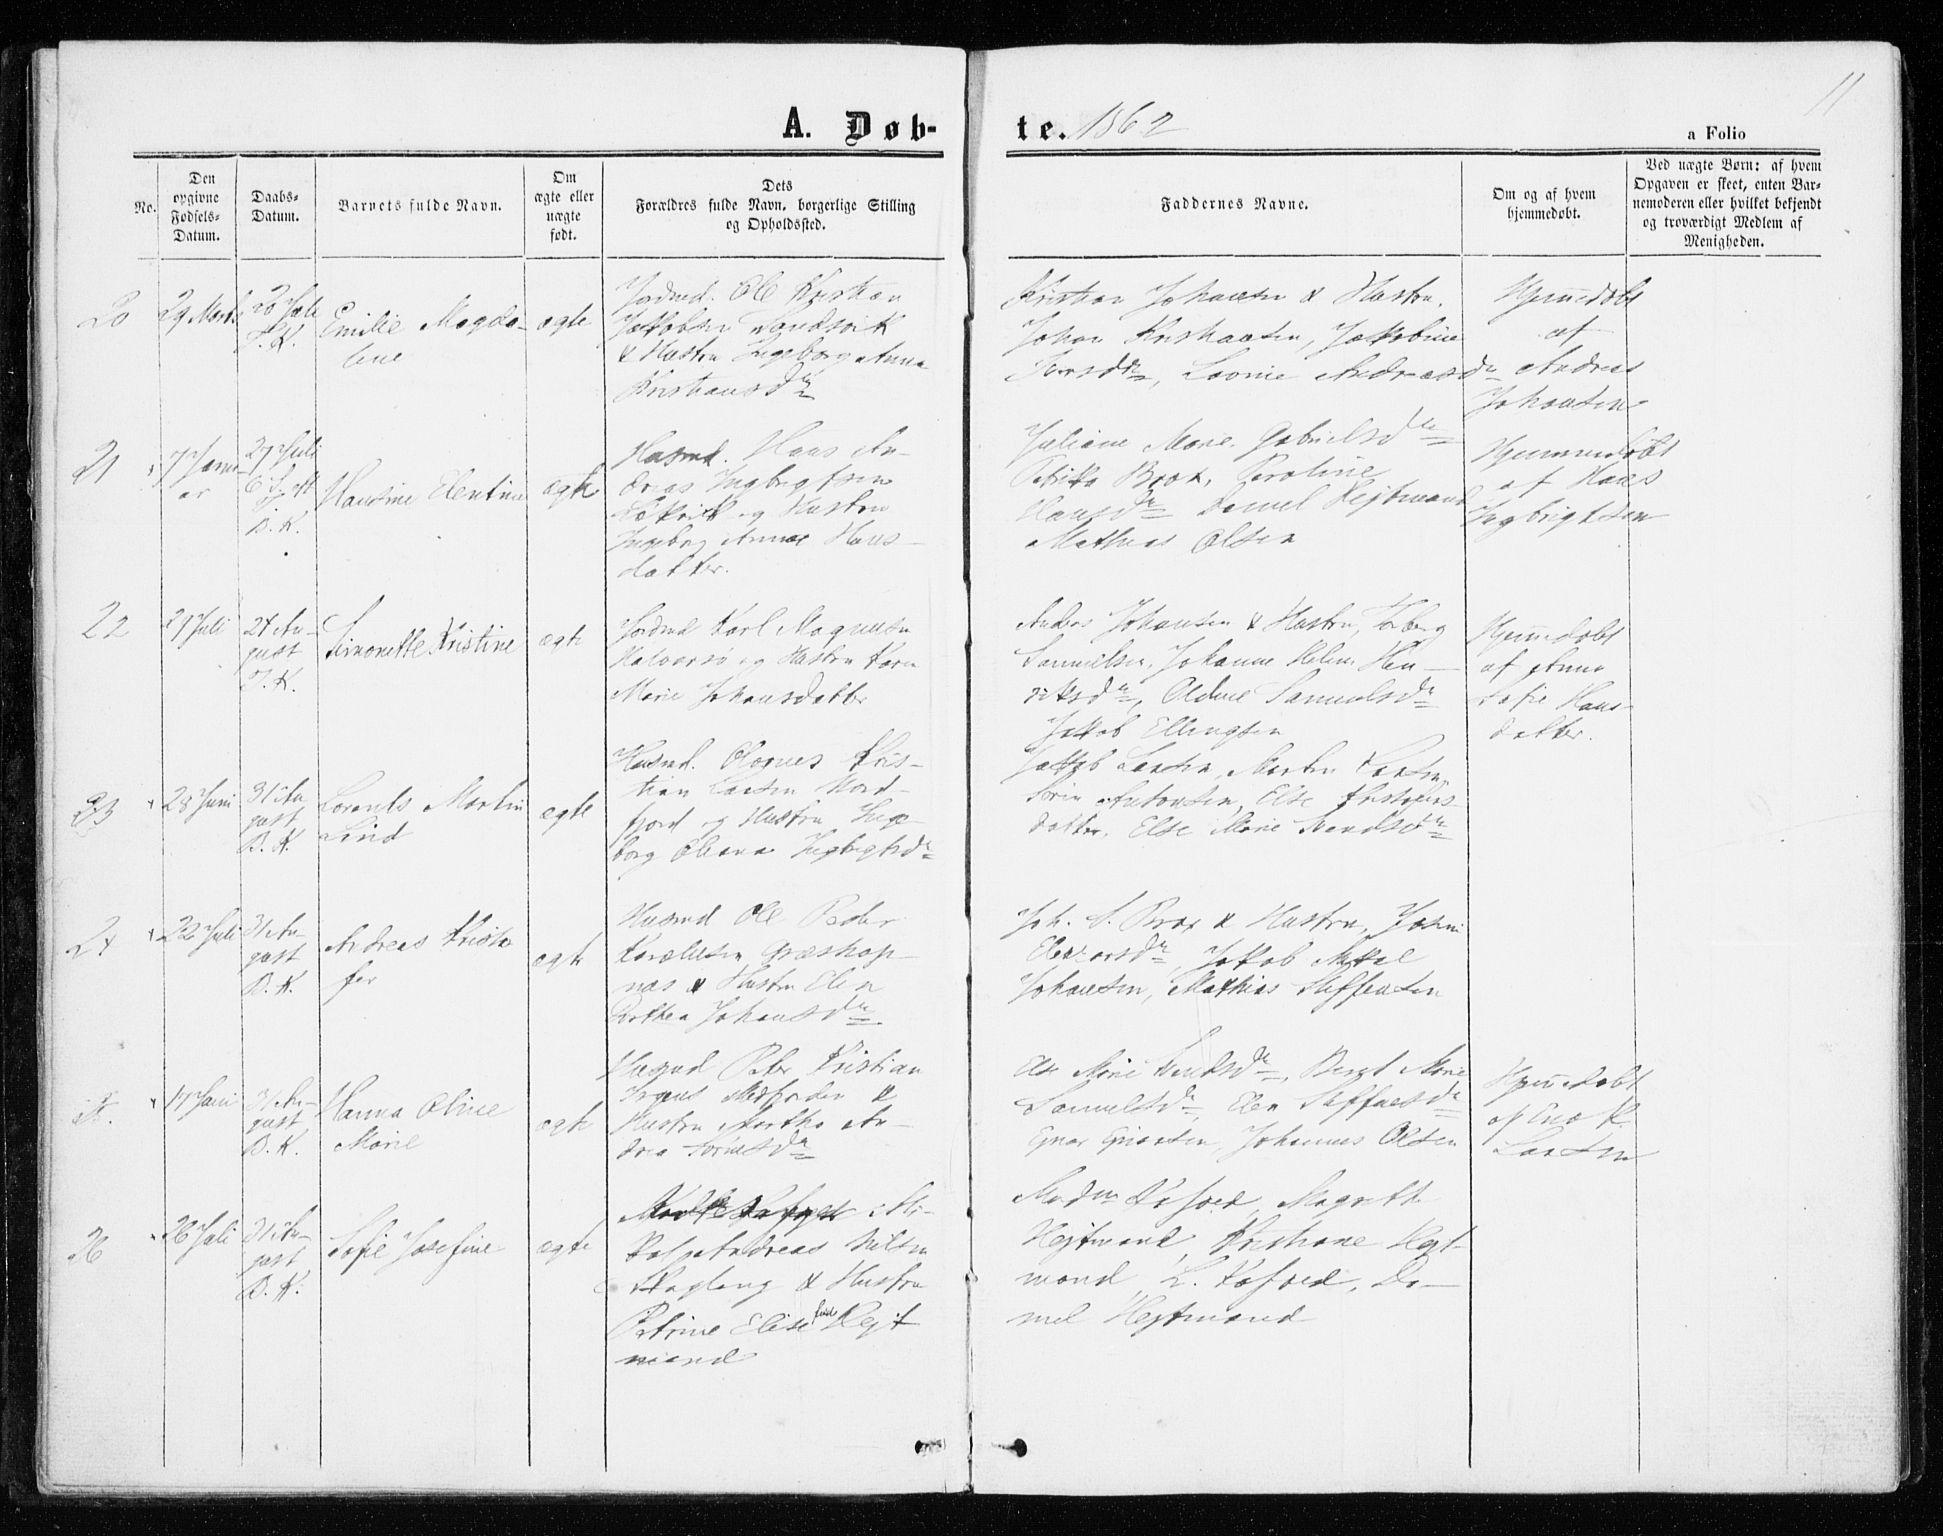 SATØ, Mefjord/Berg sokneprestkontor, G/Ga/Gaa/L0002kirke: Ministerialbok nr. 2, 1860-1872, s. 11